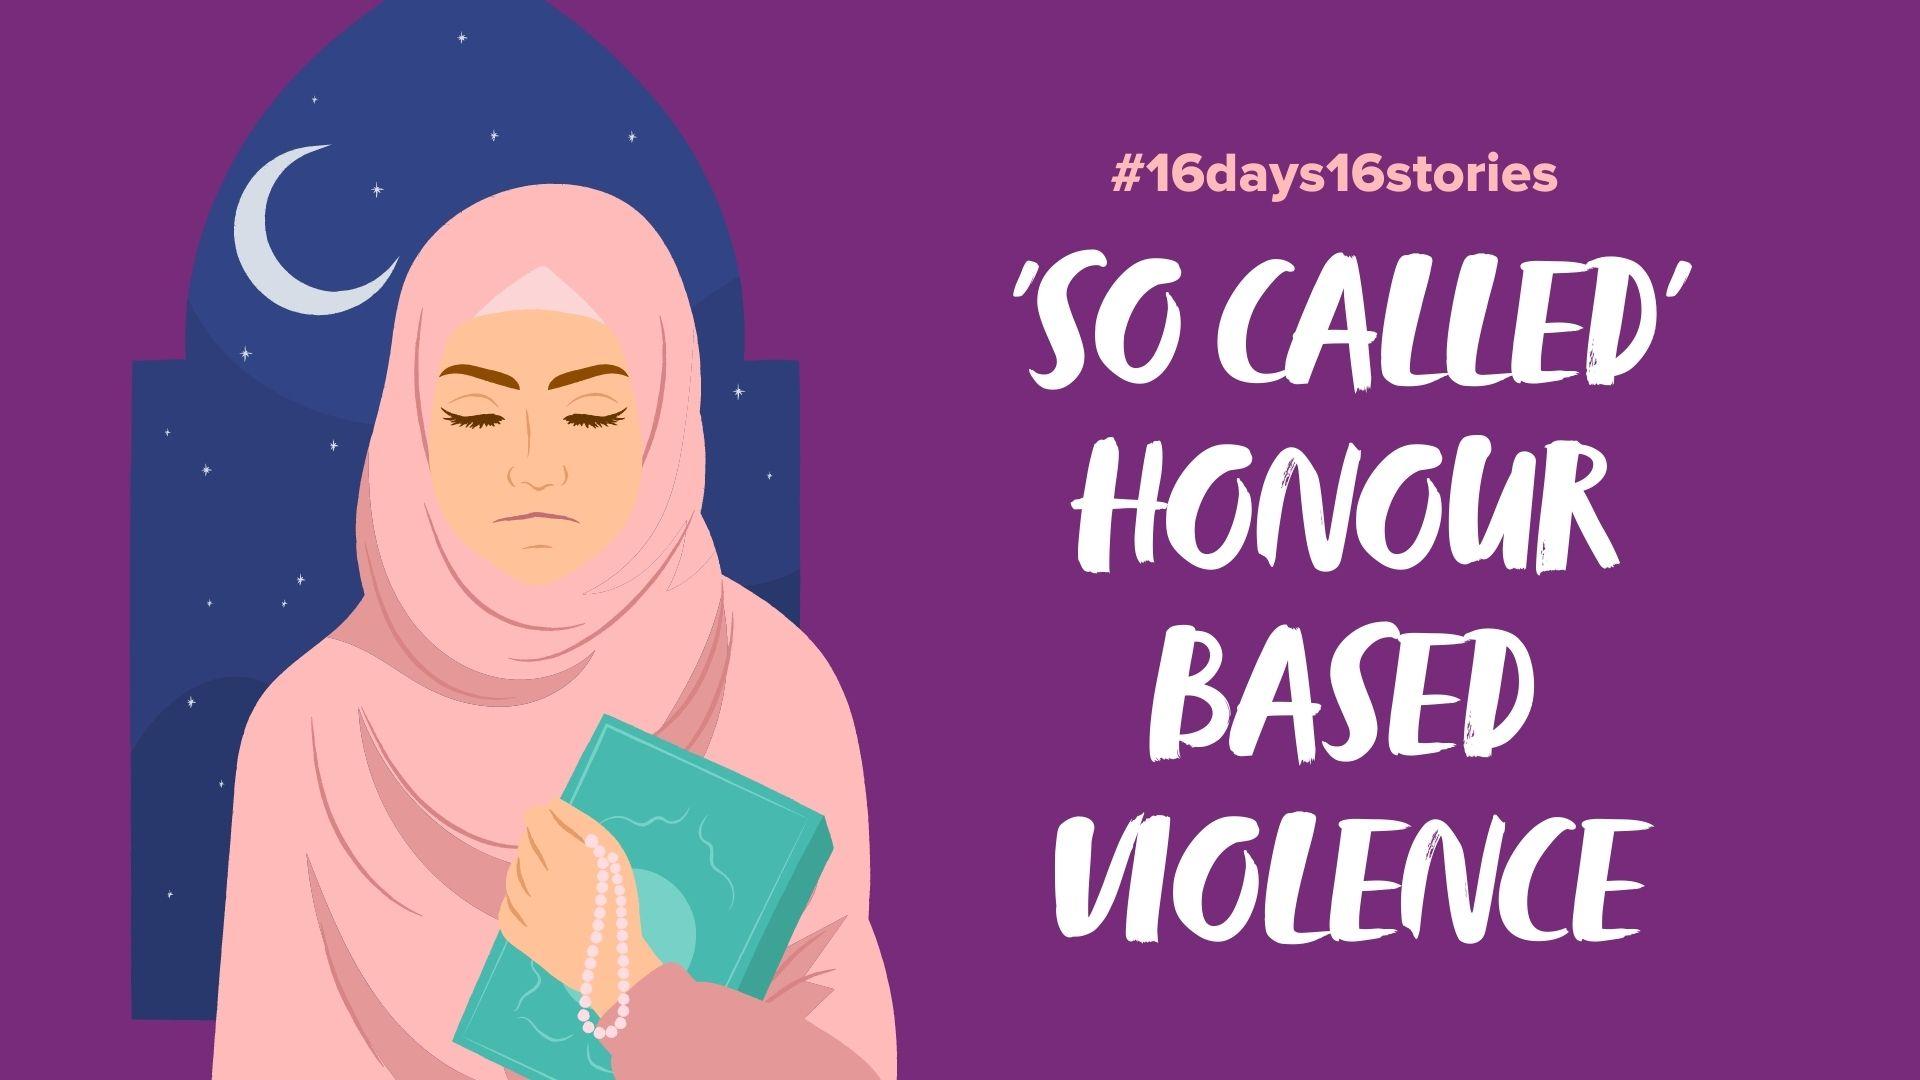 So Called Honour Based Violence